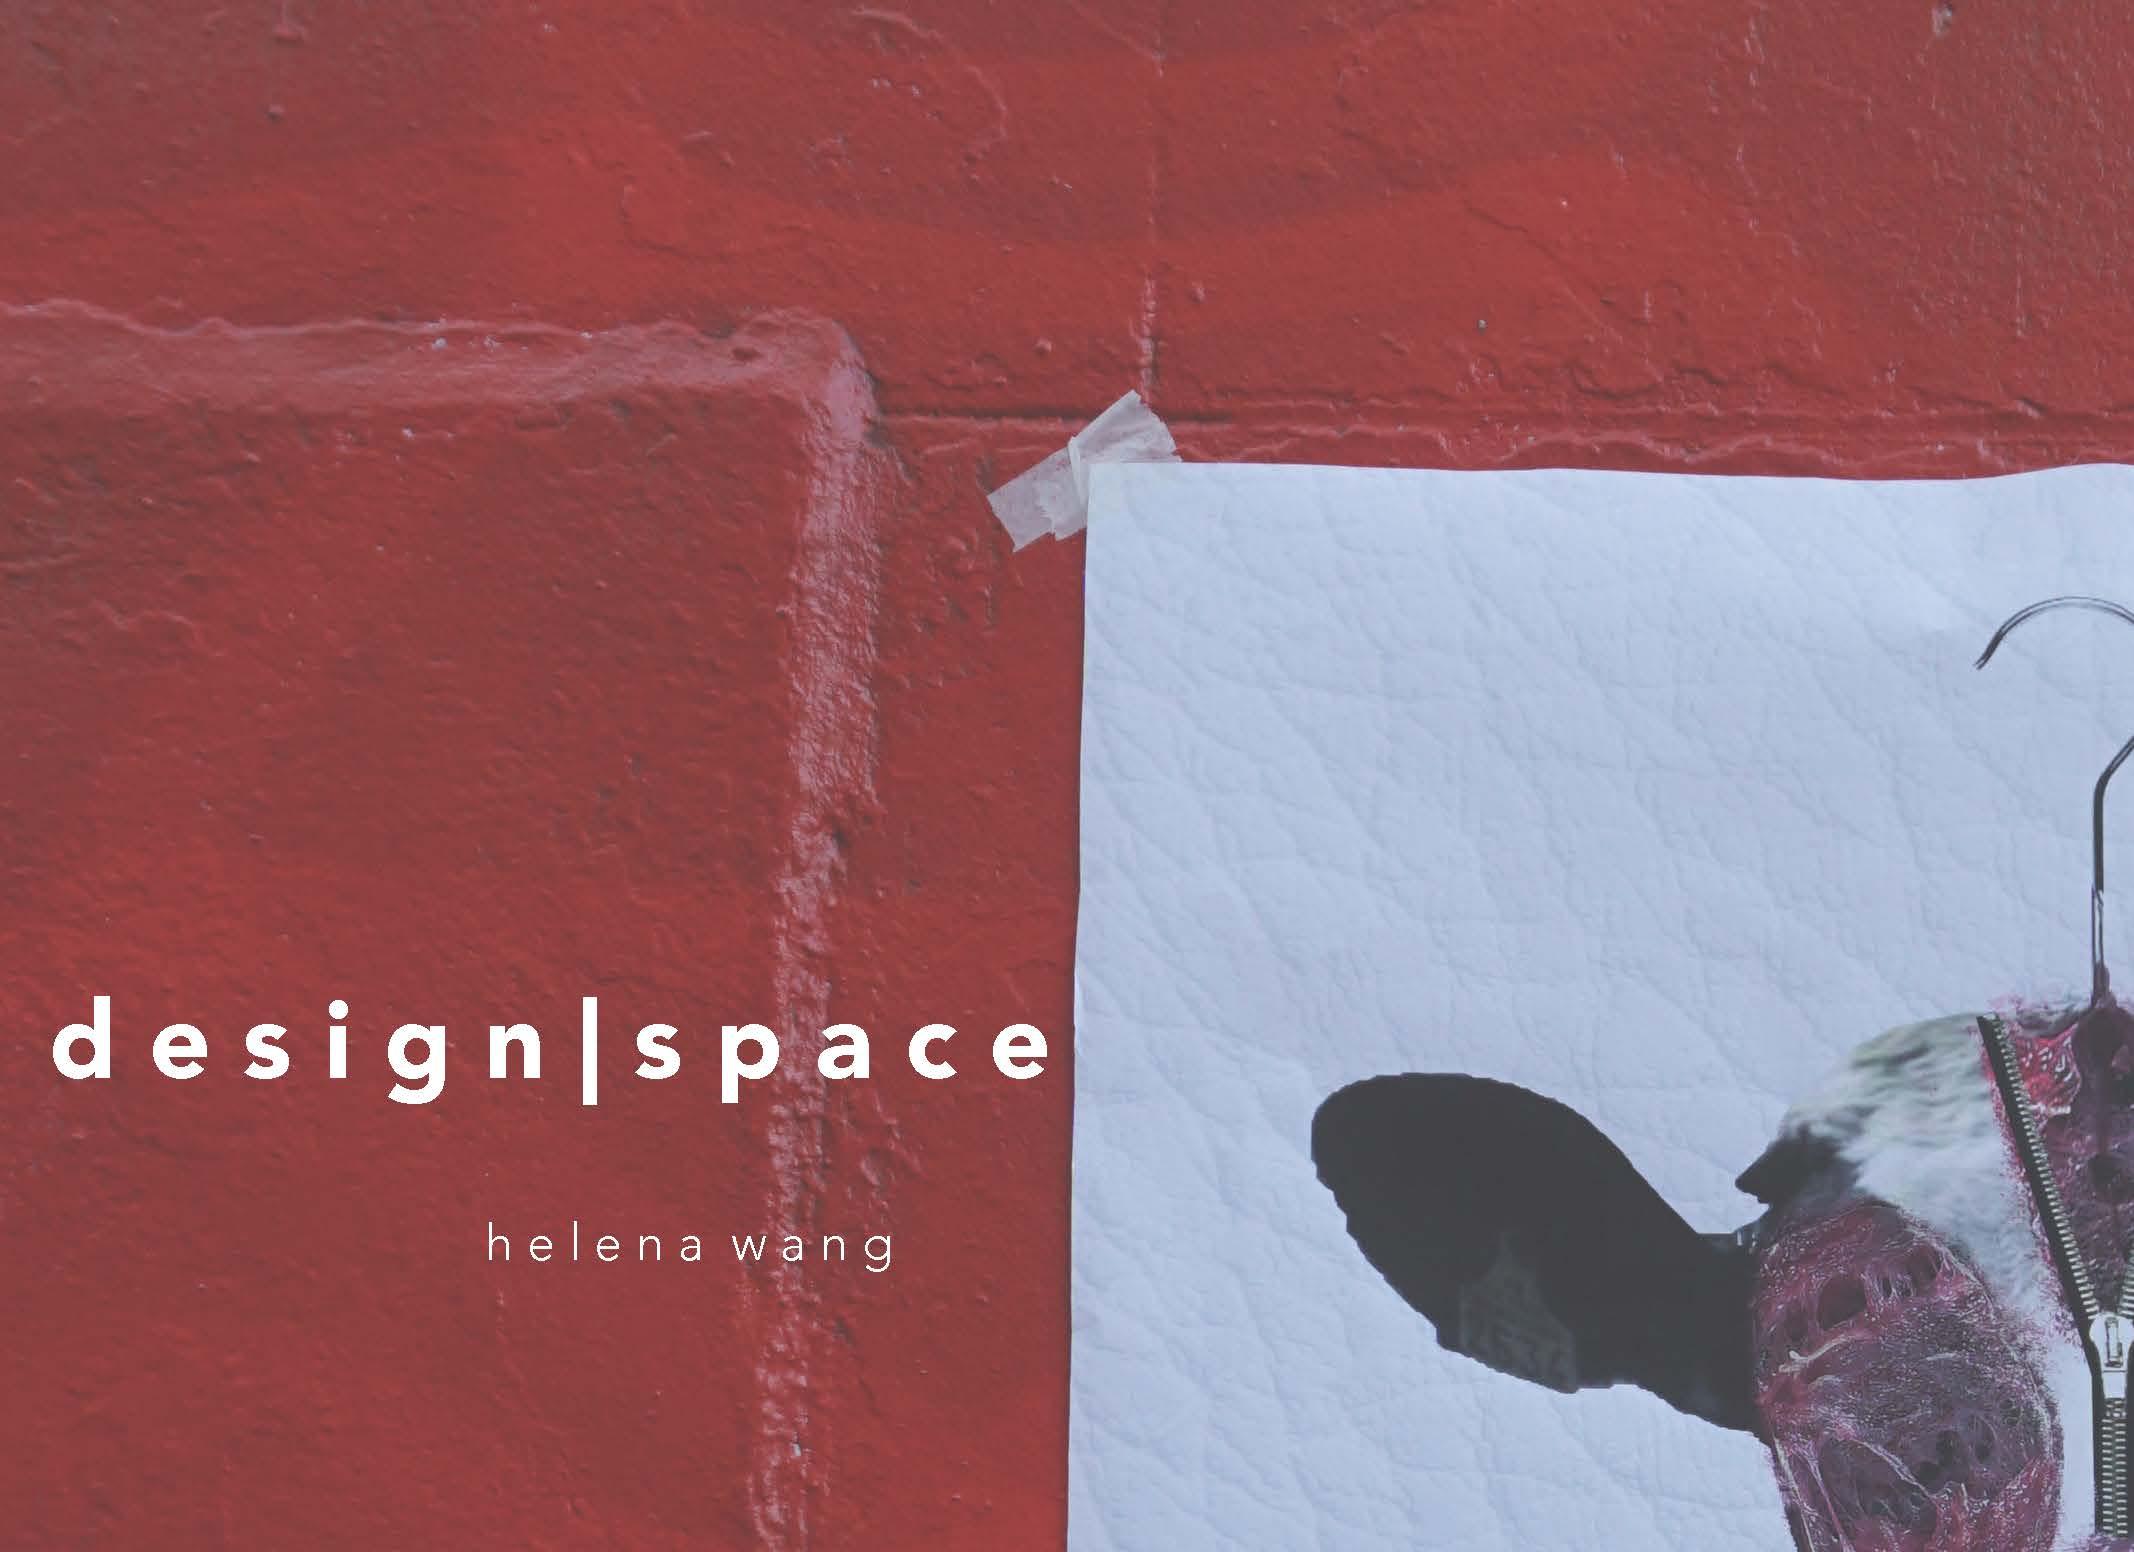 Visual Communication 2: Design & Space